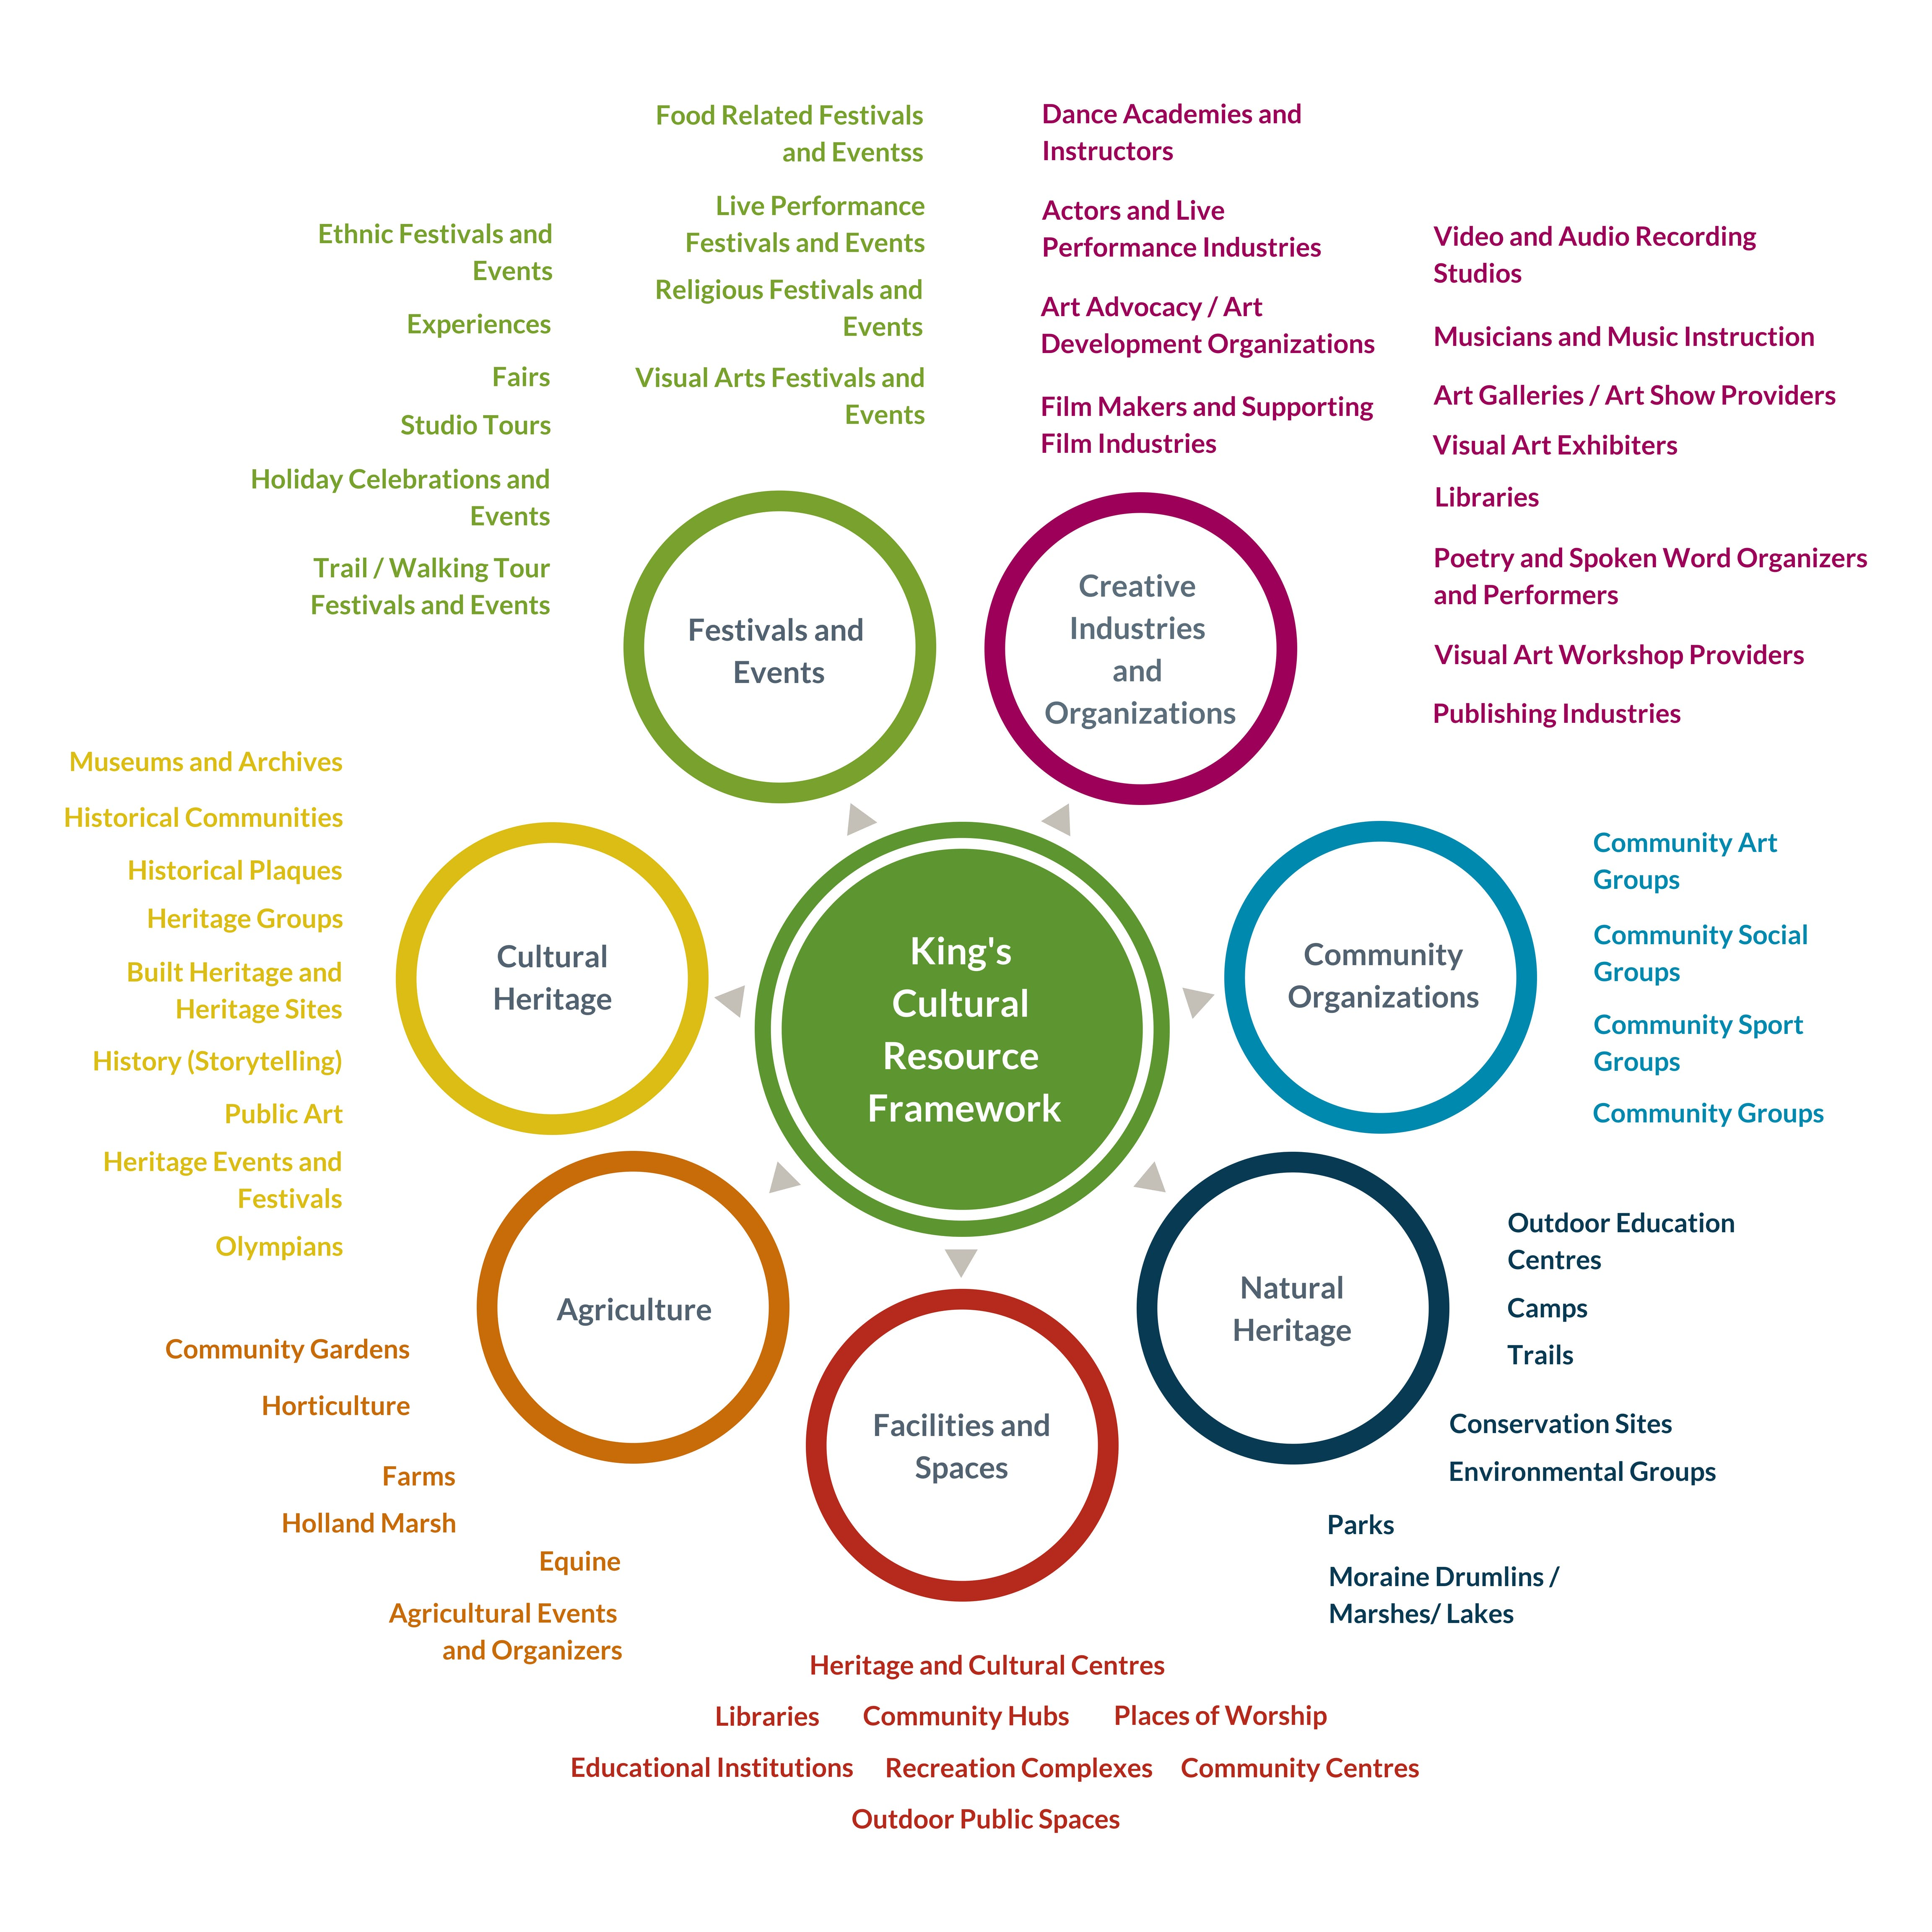 Cultural Resource Framework